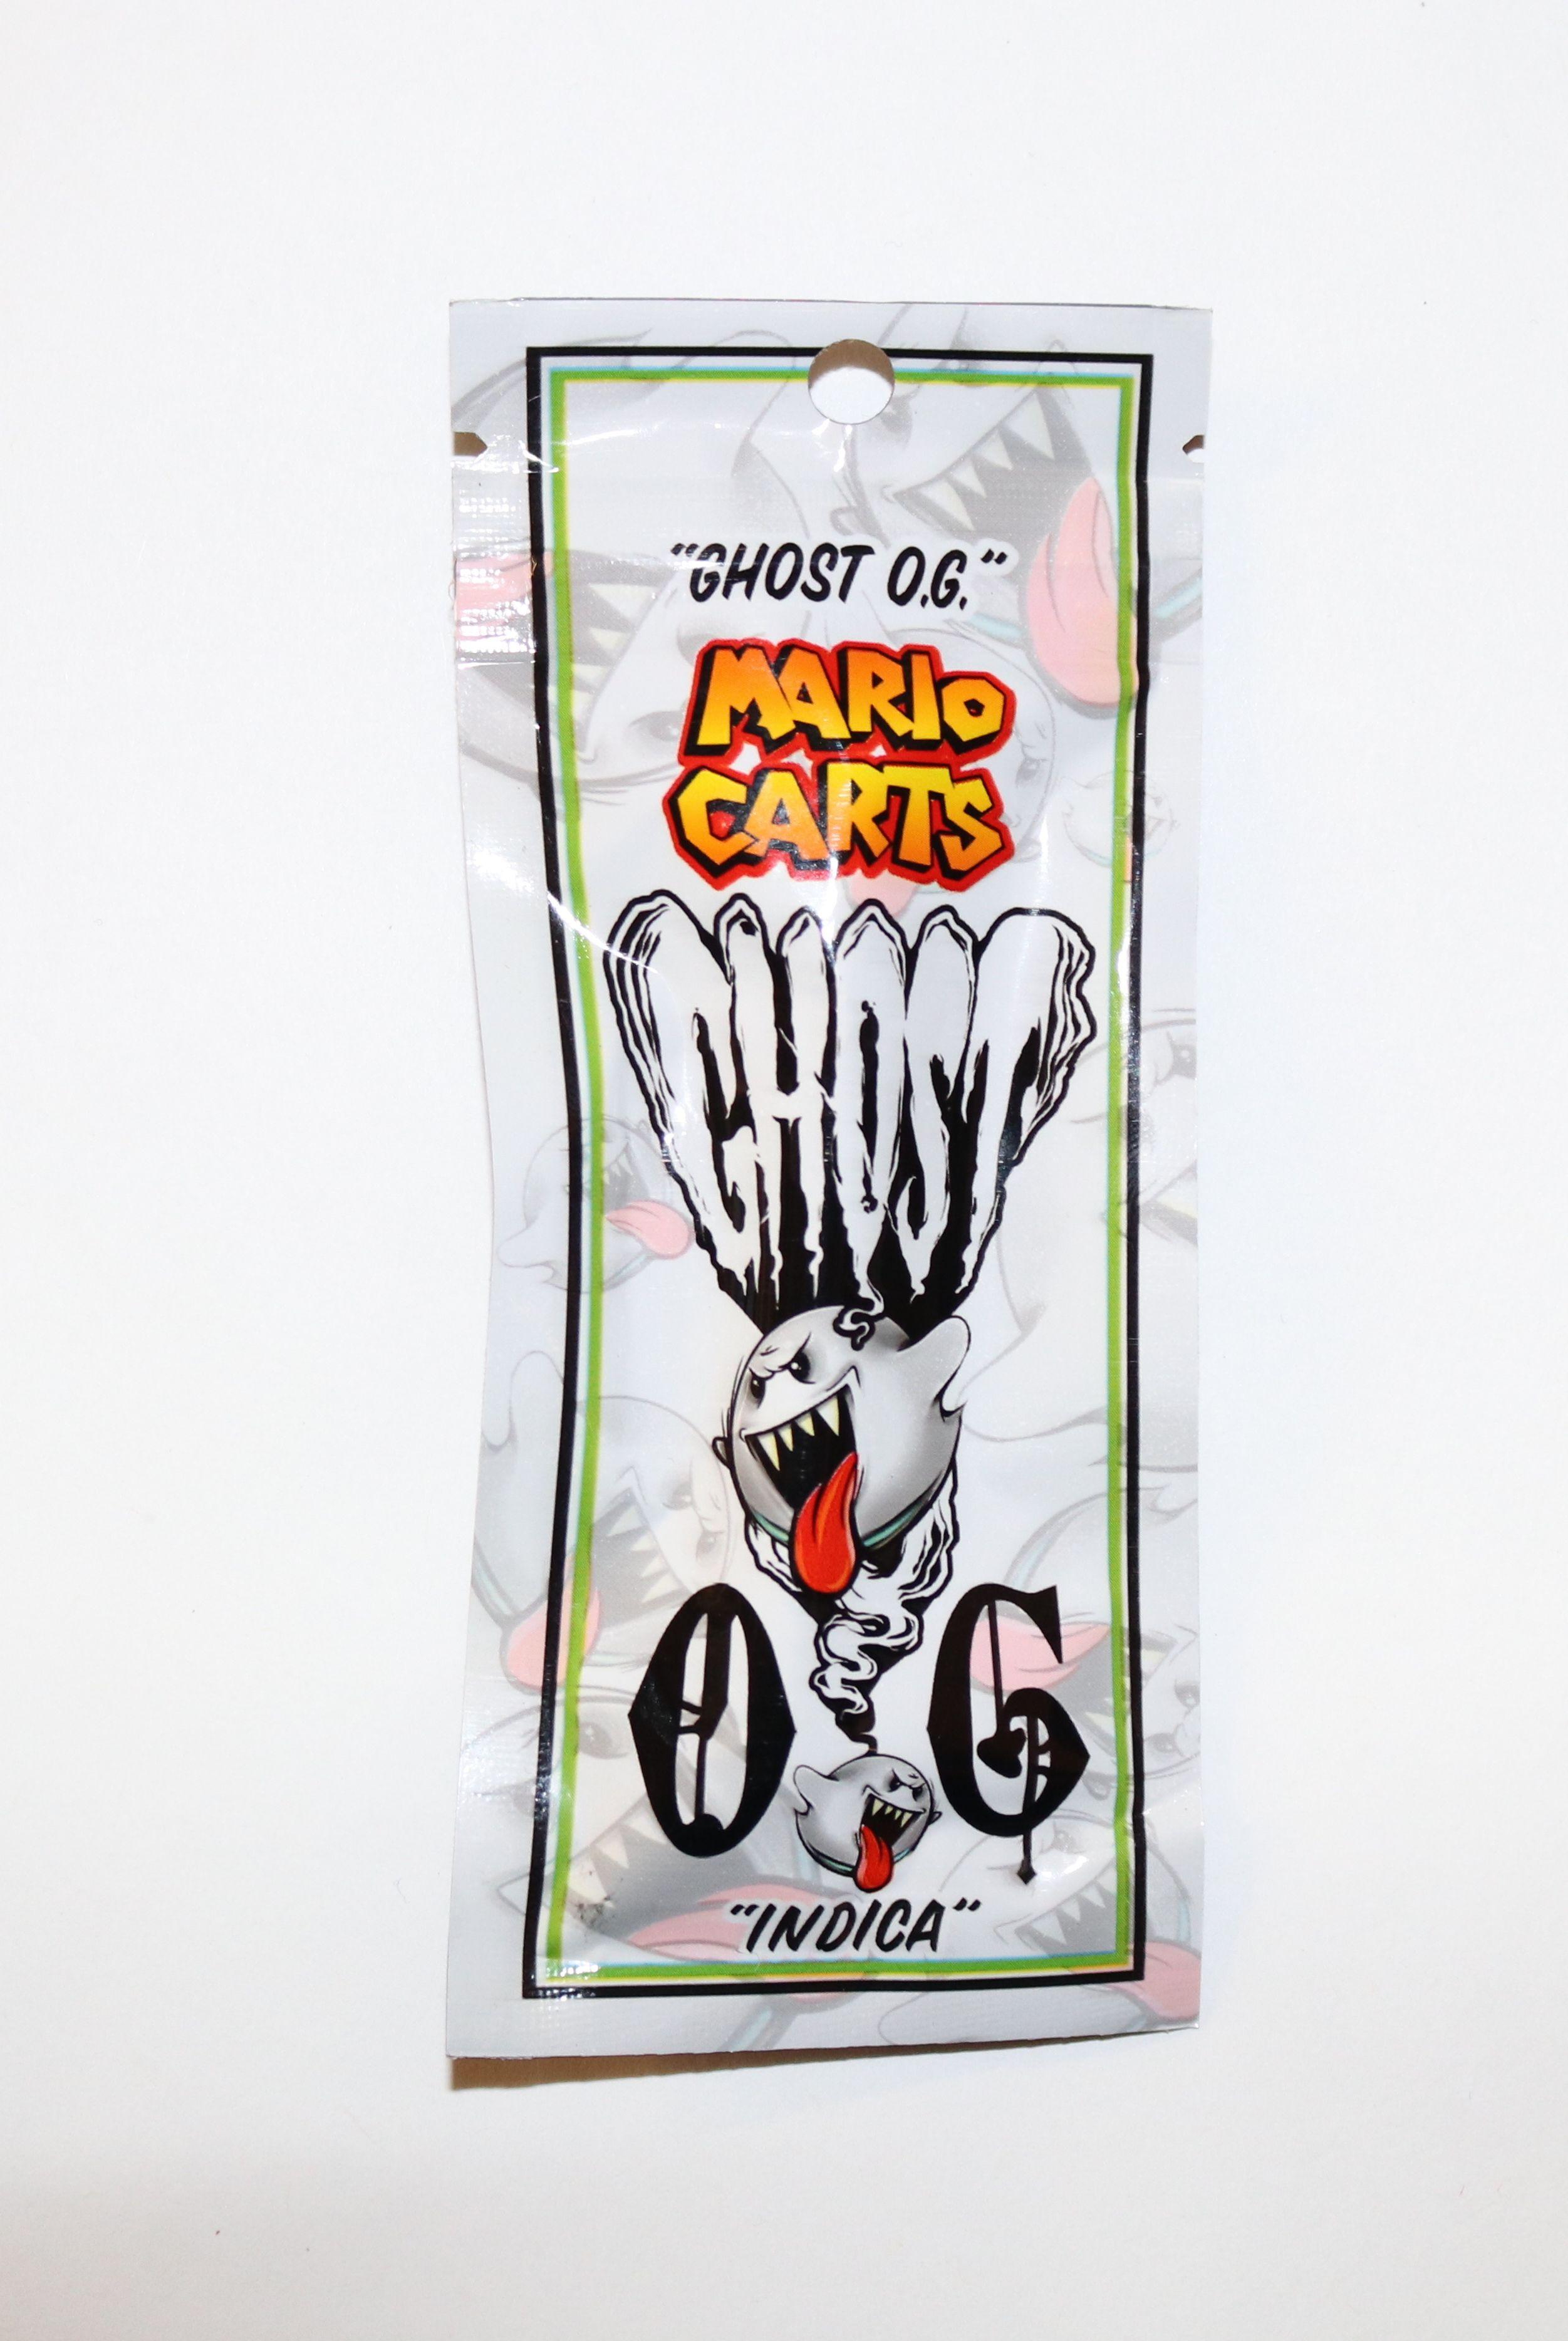 Mario Carts - Ghost OG